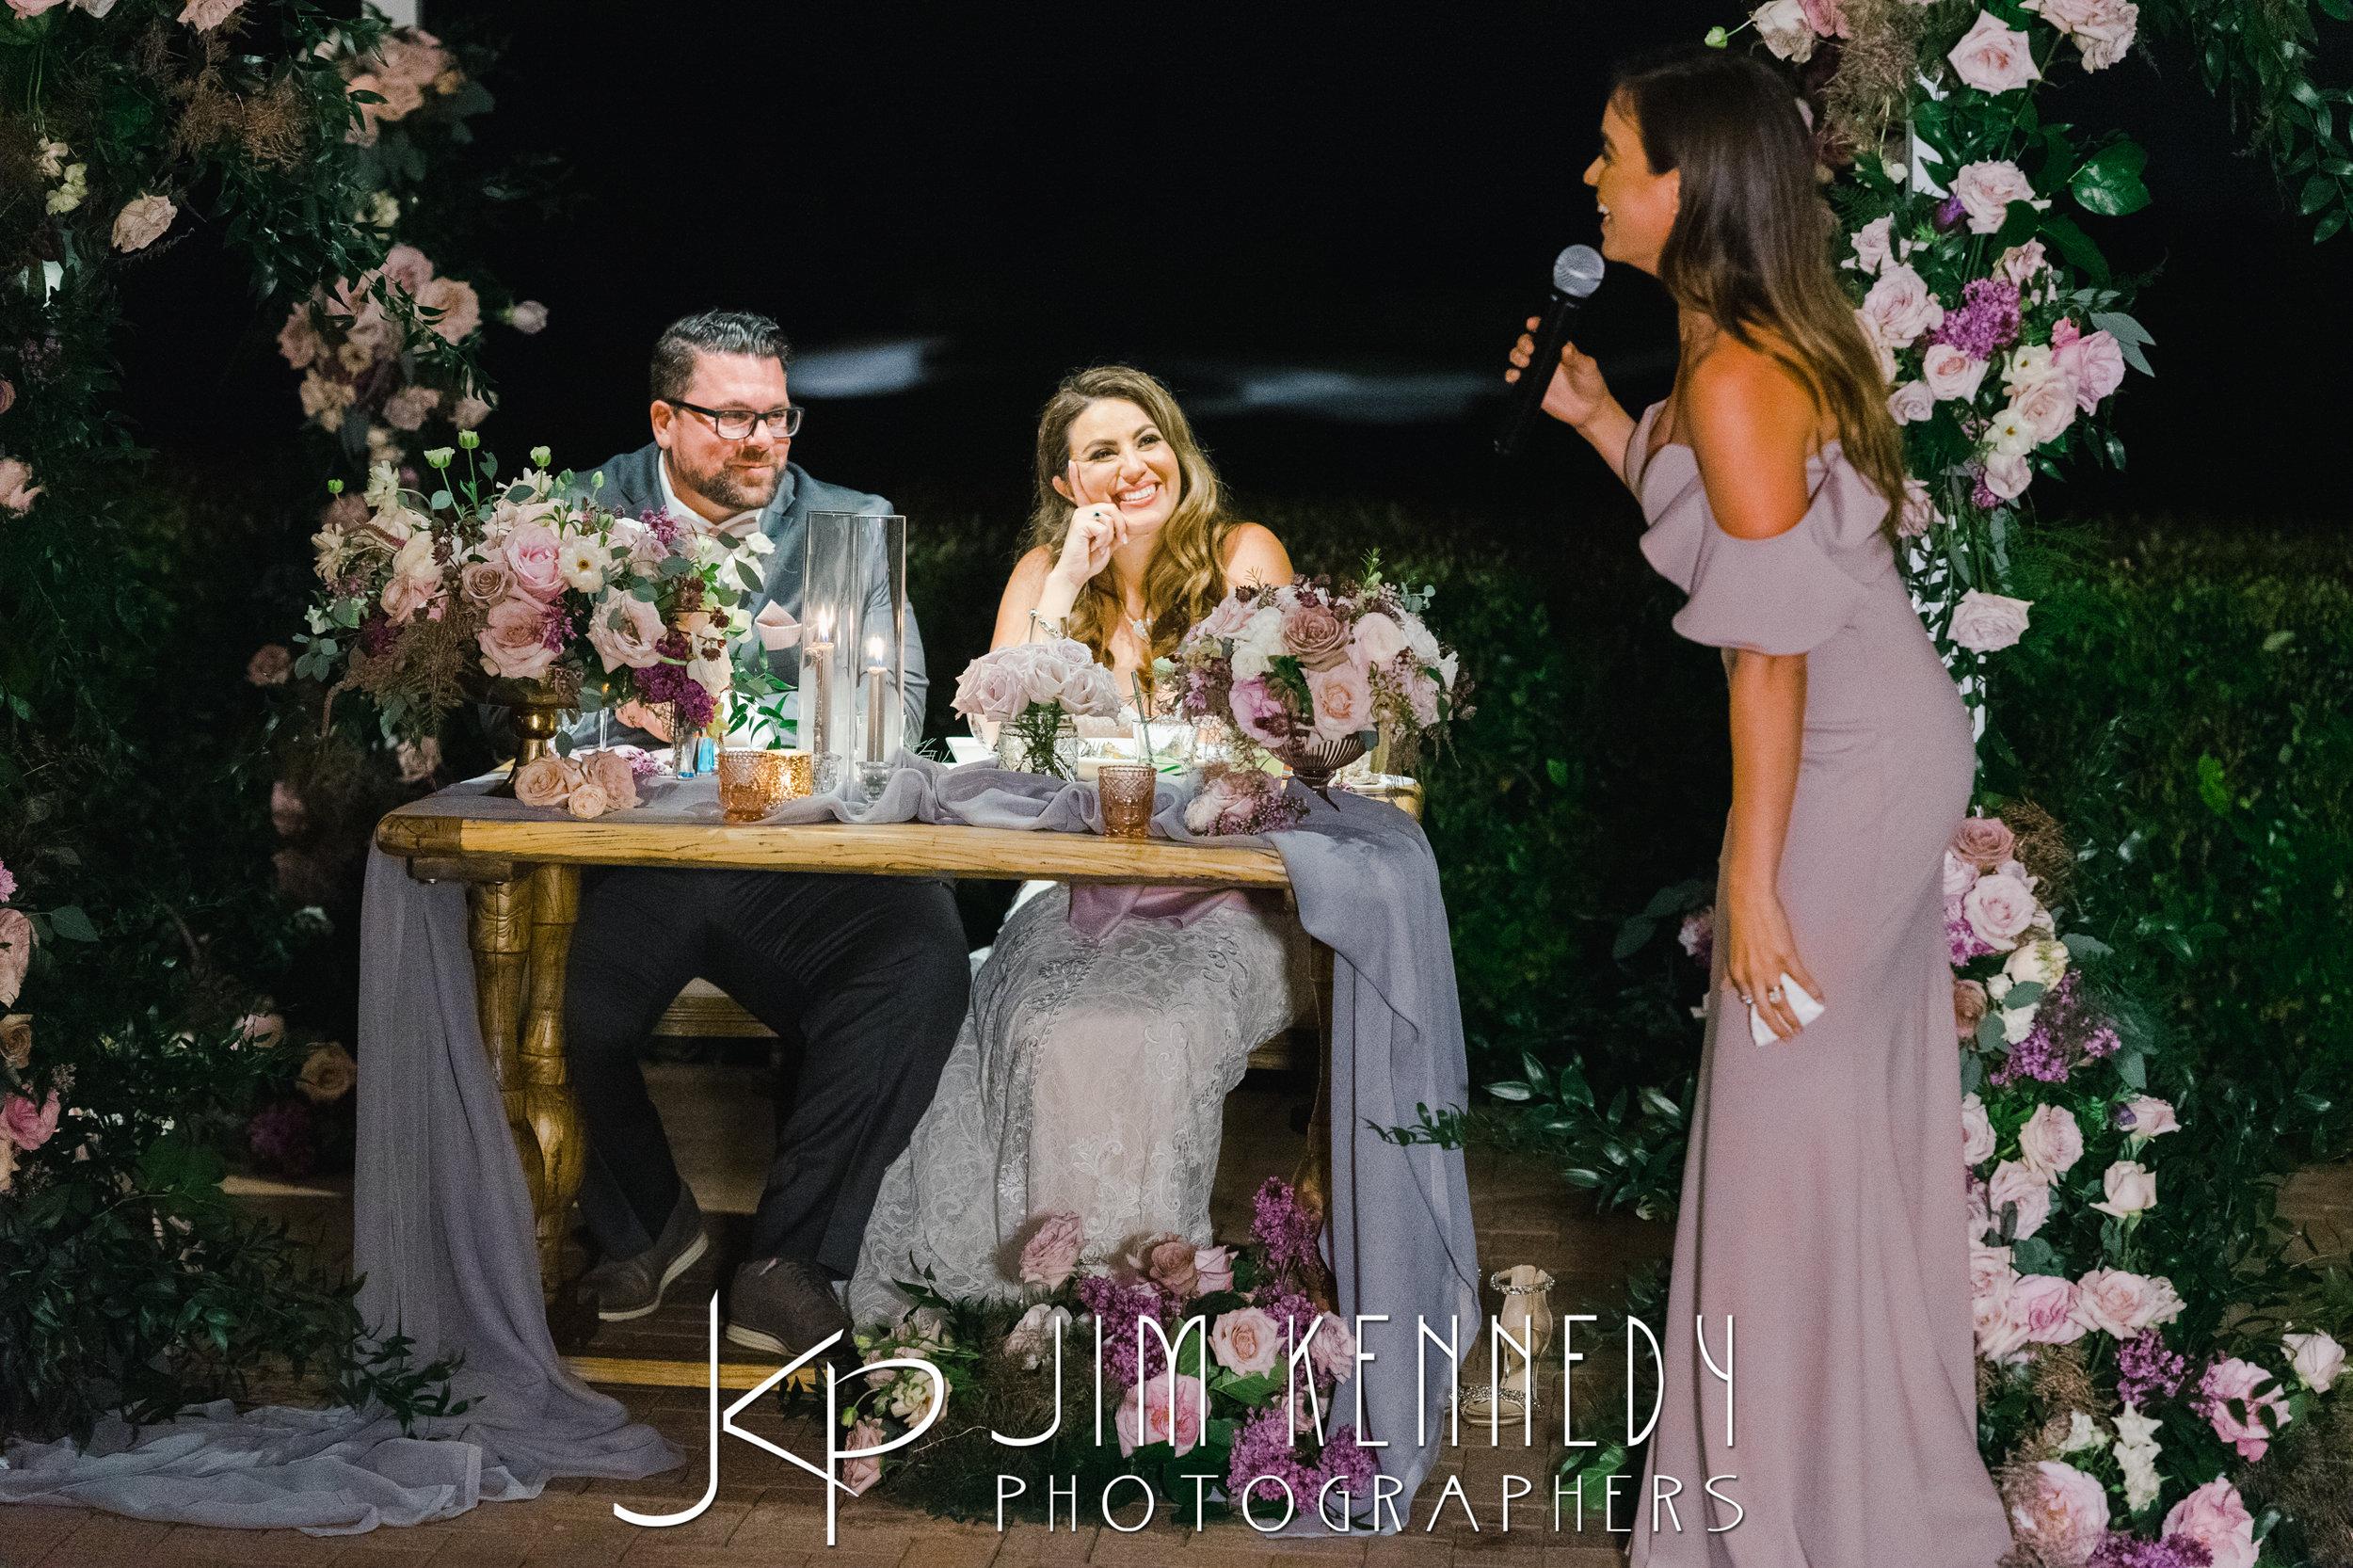 pelican-hill-wedding-jim-kenedy-photographers_0235.JPG